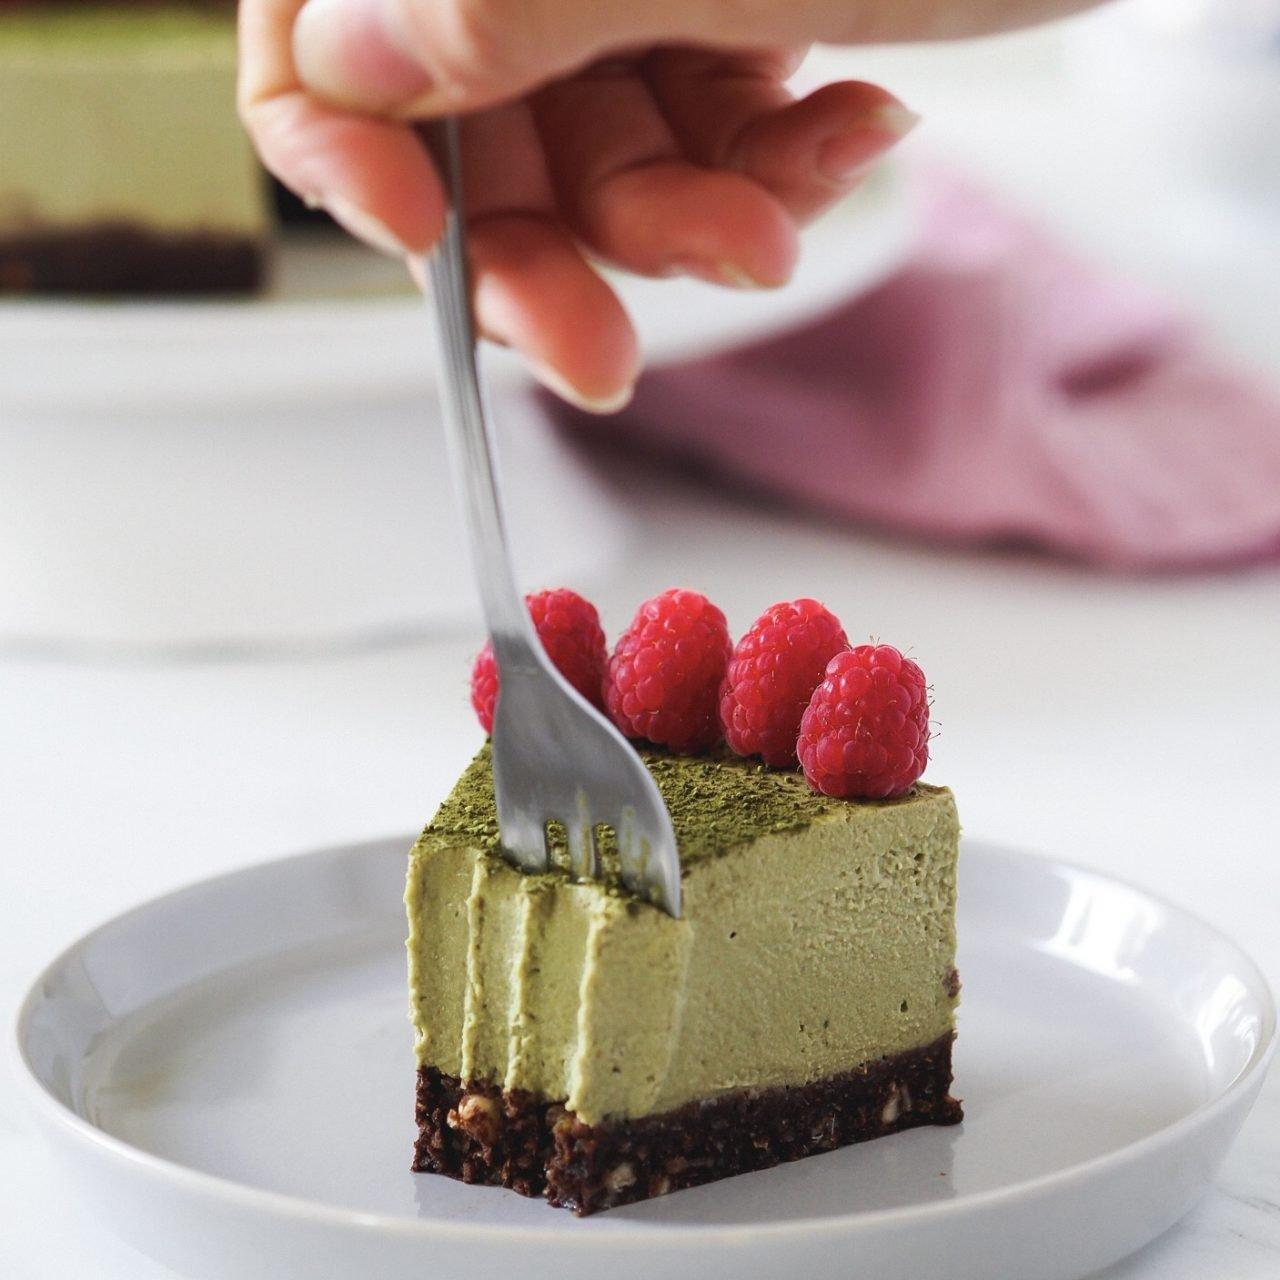 Vegan matcha cheesecake (sin azúcar y sin gluten)